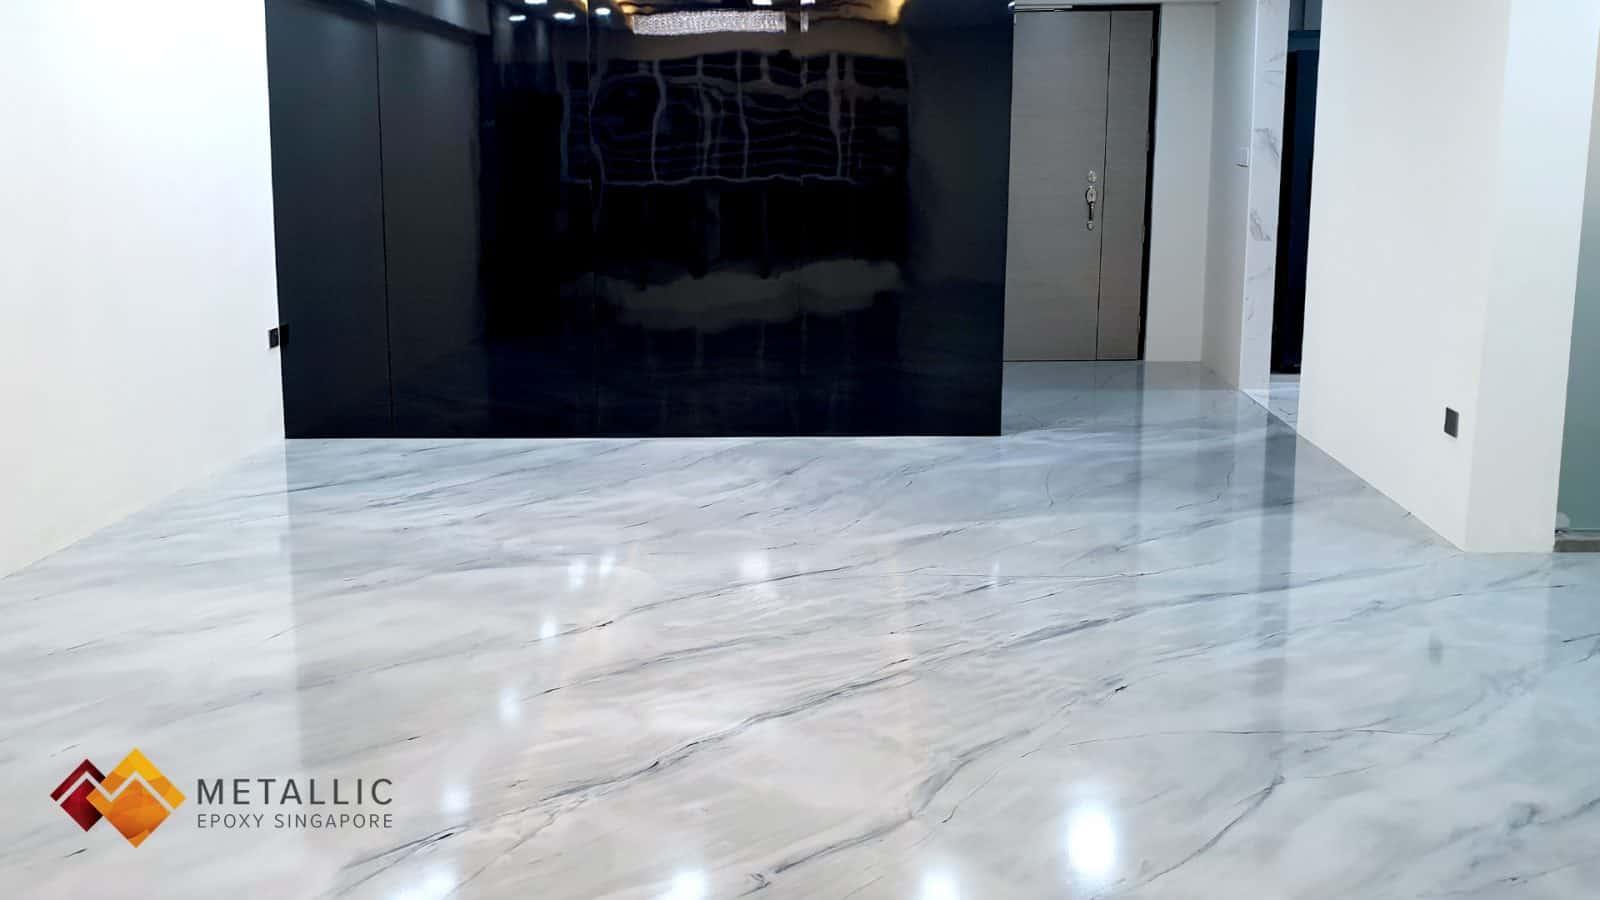 Metallic Epoxy Singapore Grey Mixed Marble Flooring